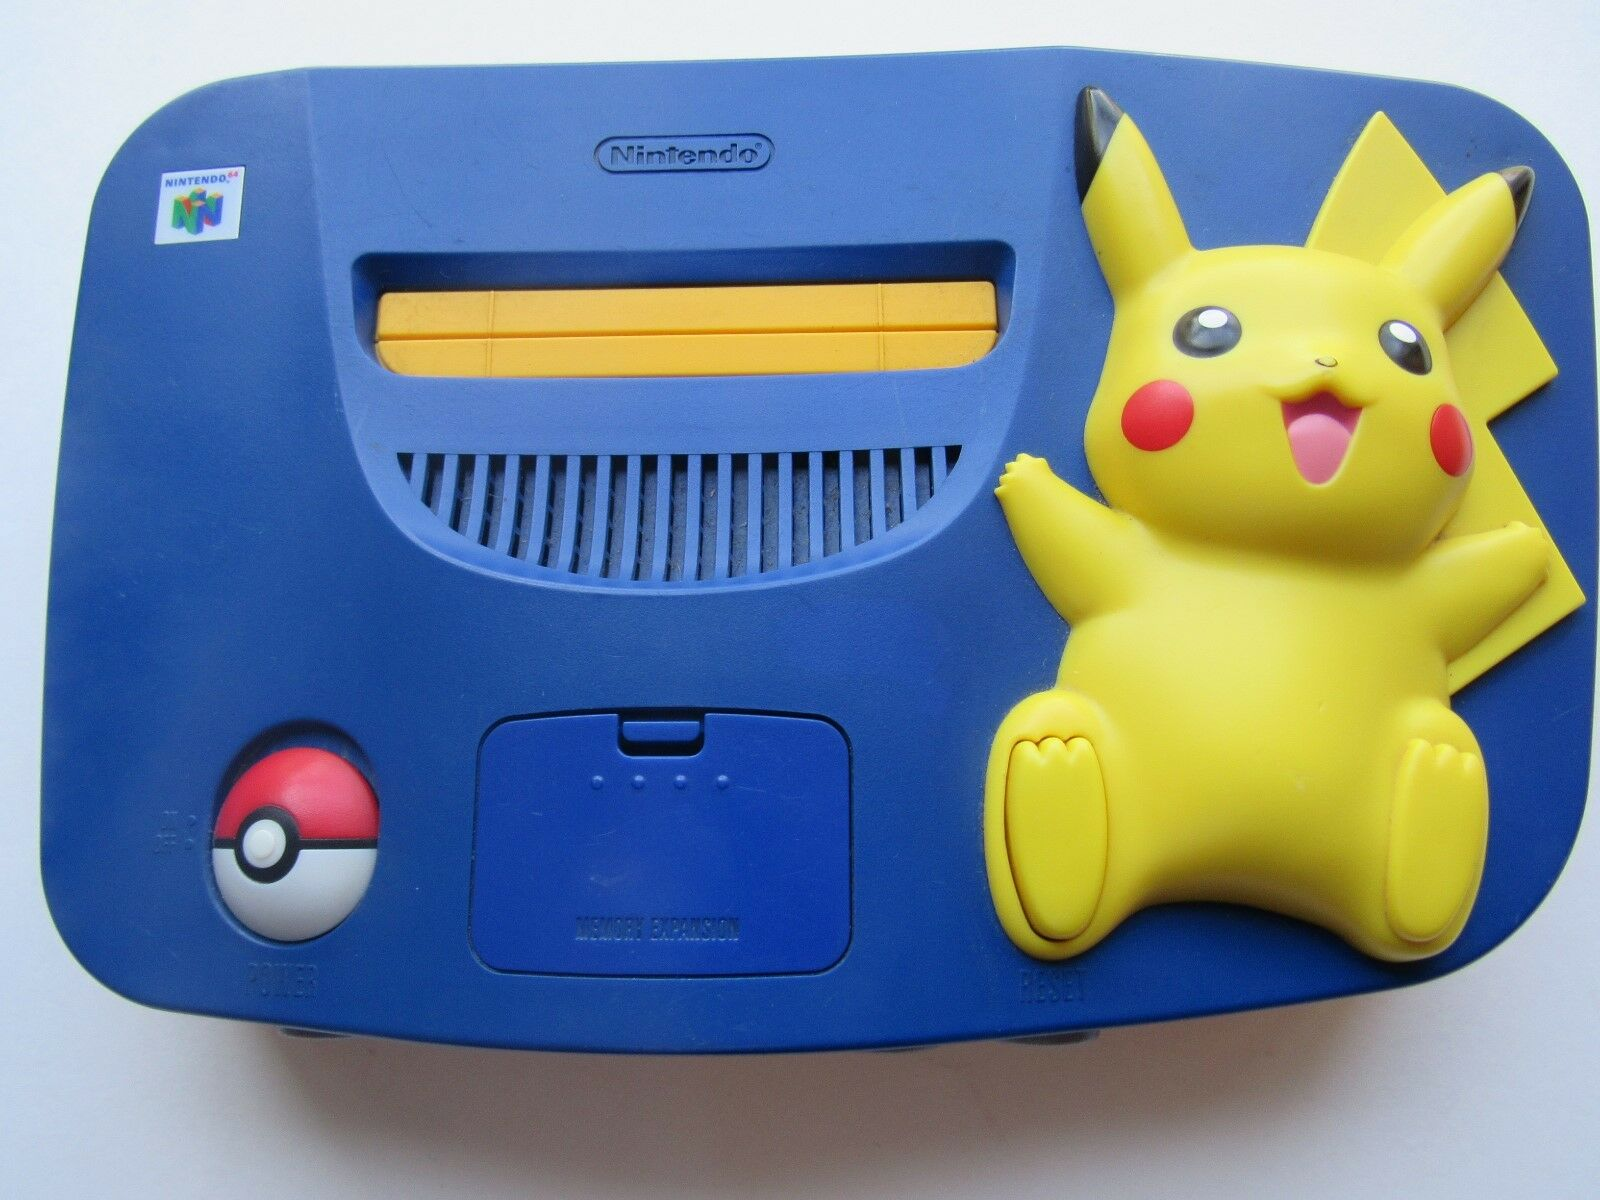 *GOOD* Nintendo 64 N64 Video Game Console Selection Funtastic Pokemon Gold PICK! Pikachu Pokemon *Console & Jumper* TOYS R US